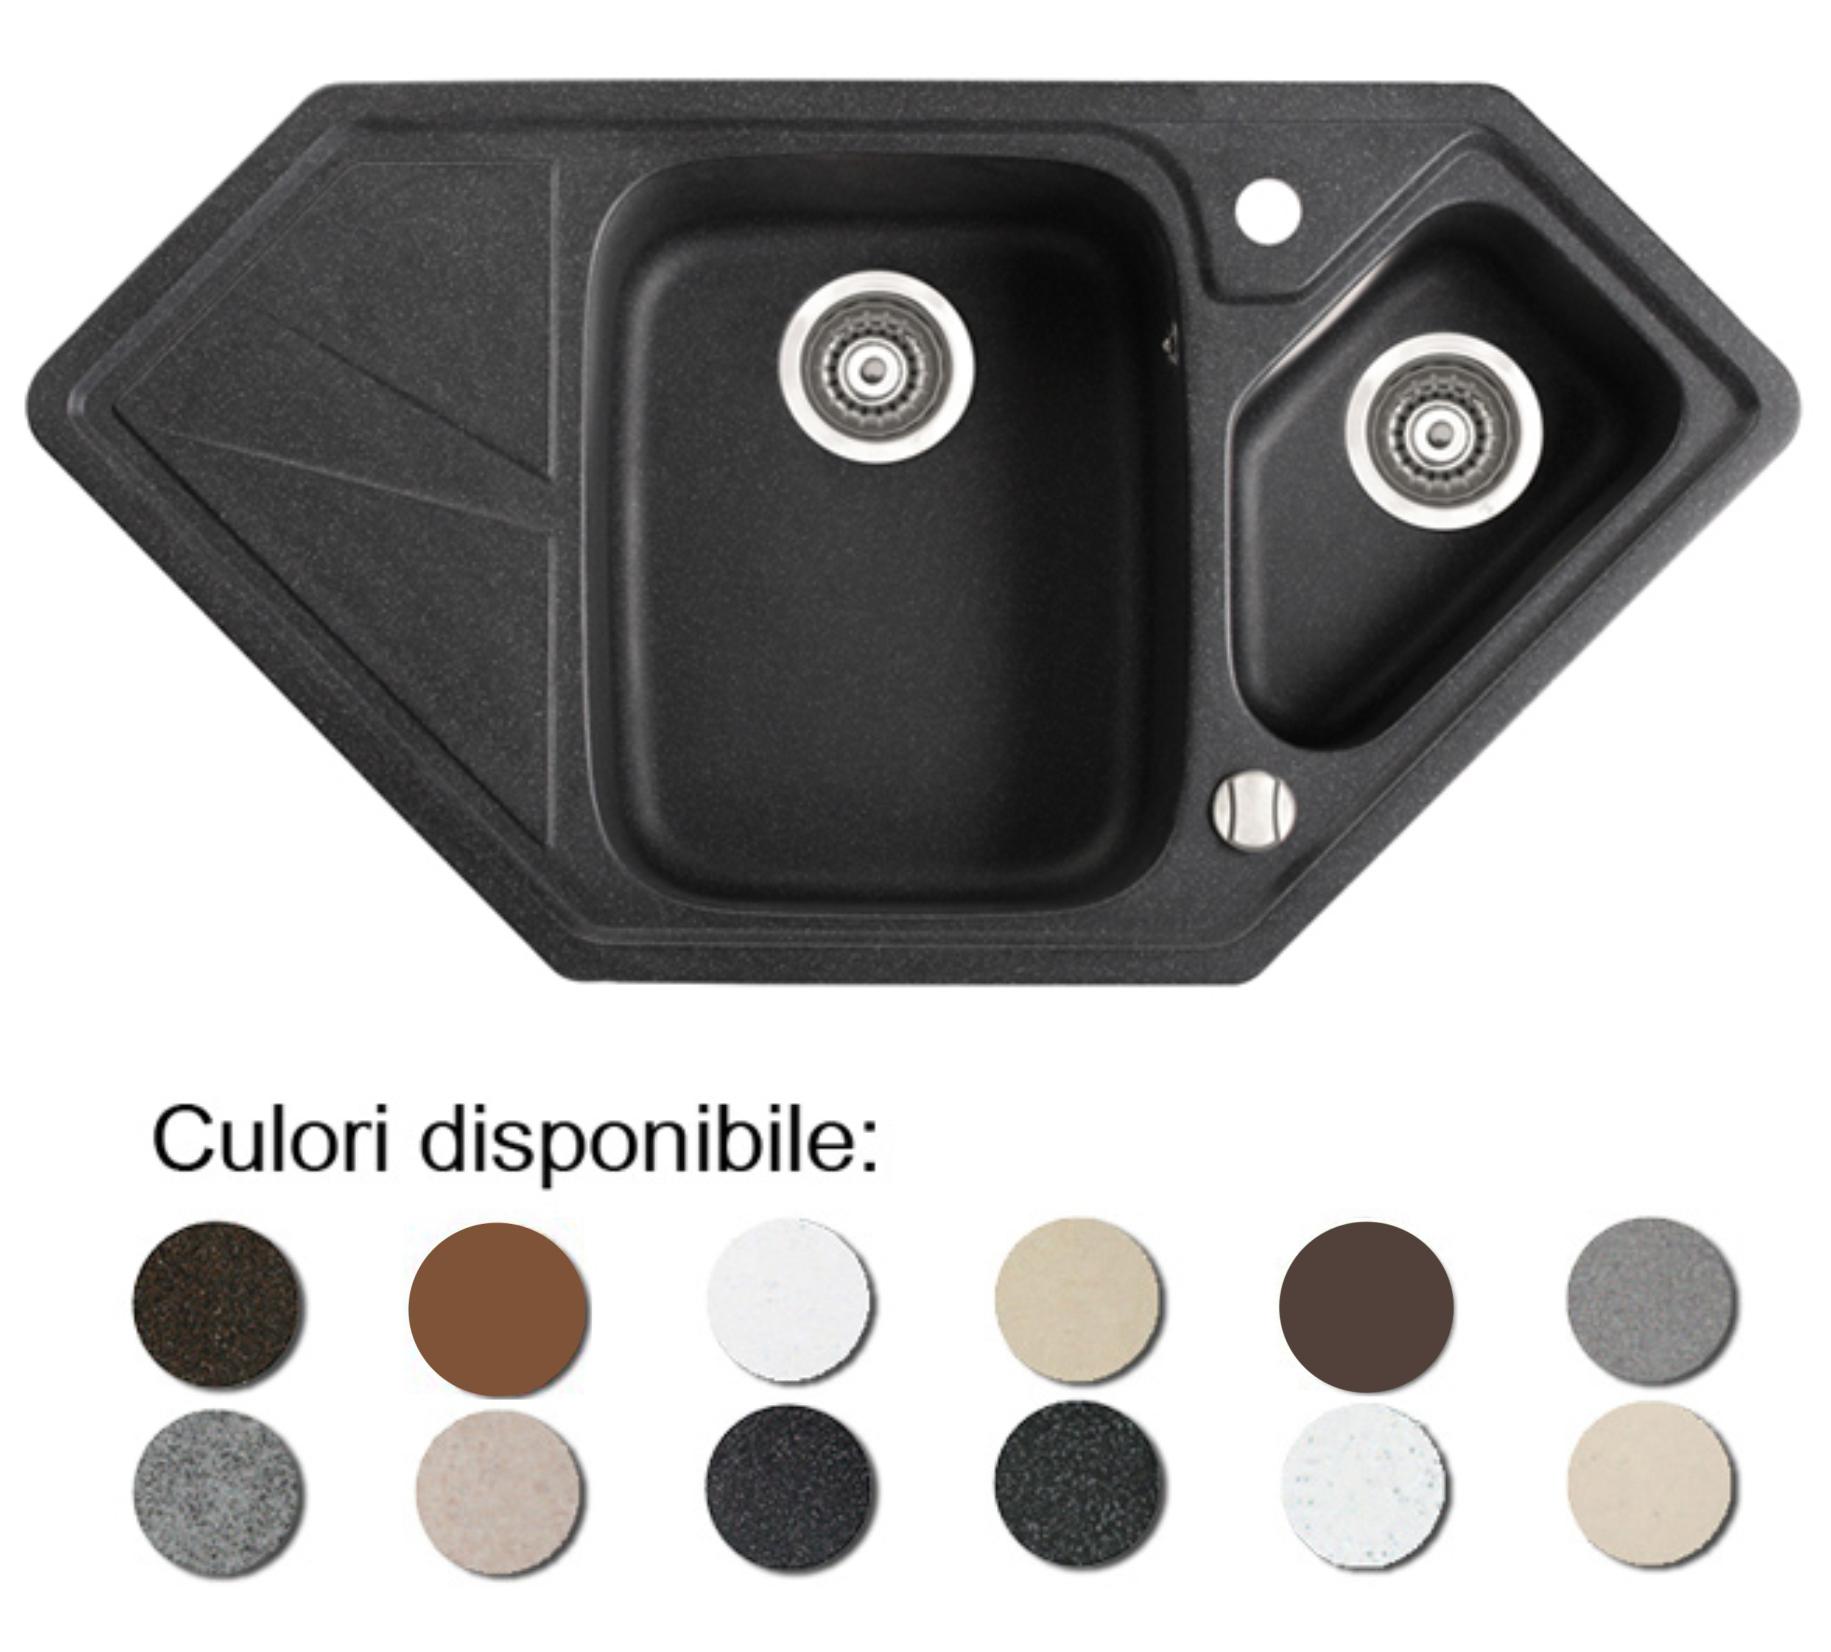 Chiuveta Bucatarie Granit Compozit Anticalcar Trapezoidala Cuve Picurator Imagine